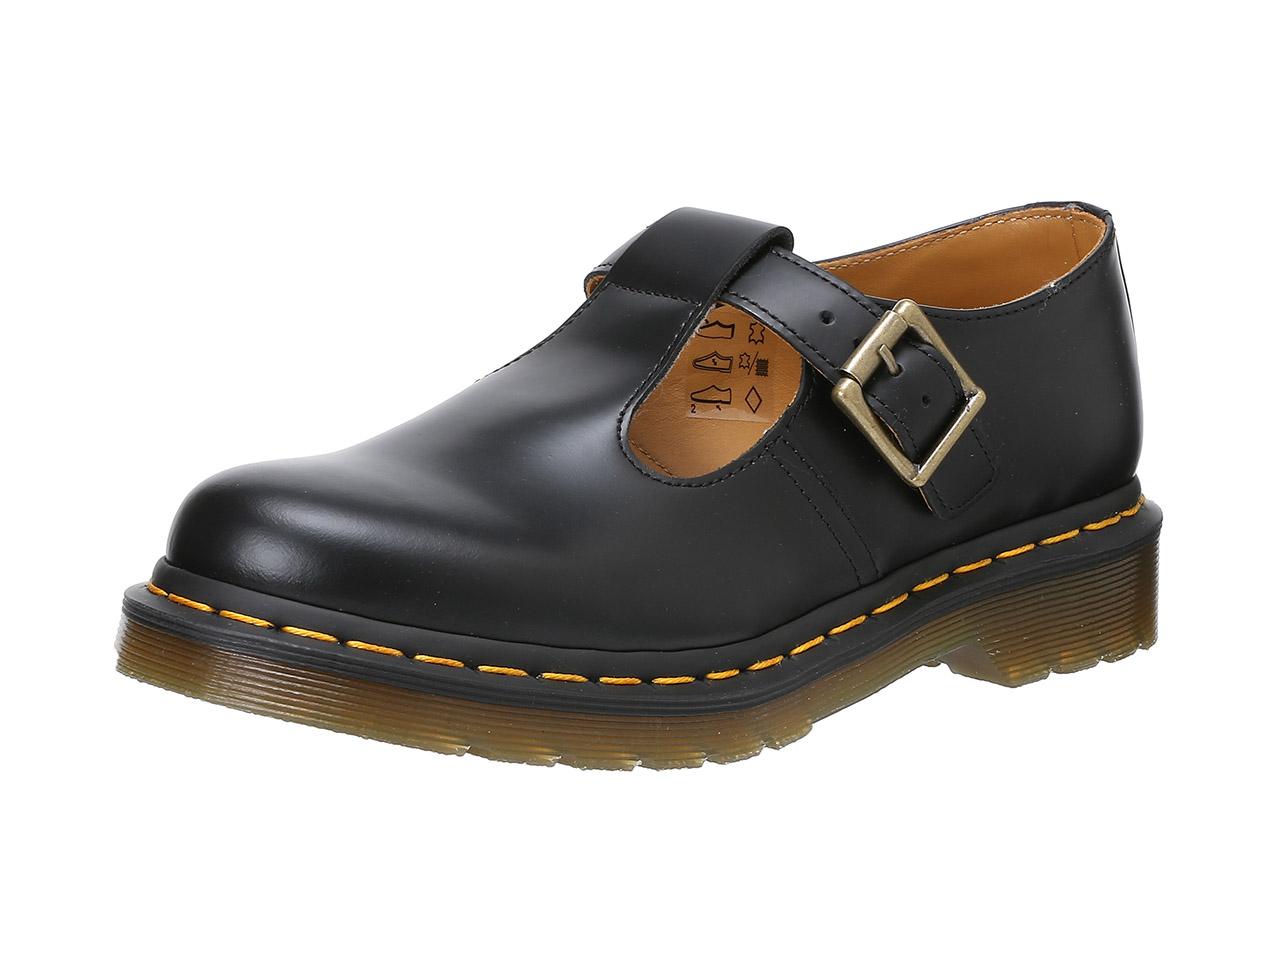 Dr.Martens Polley(14852001)【ドクターマーチン】【レディースファッション】【シューズ】【ブーツ】【靴】【フットウェア】